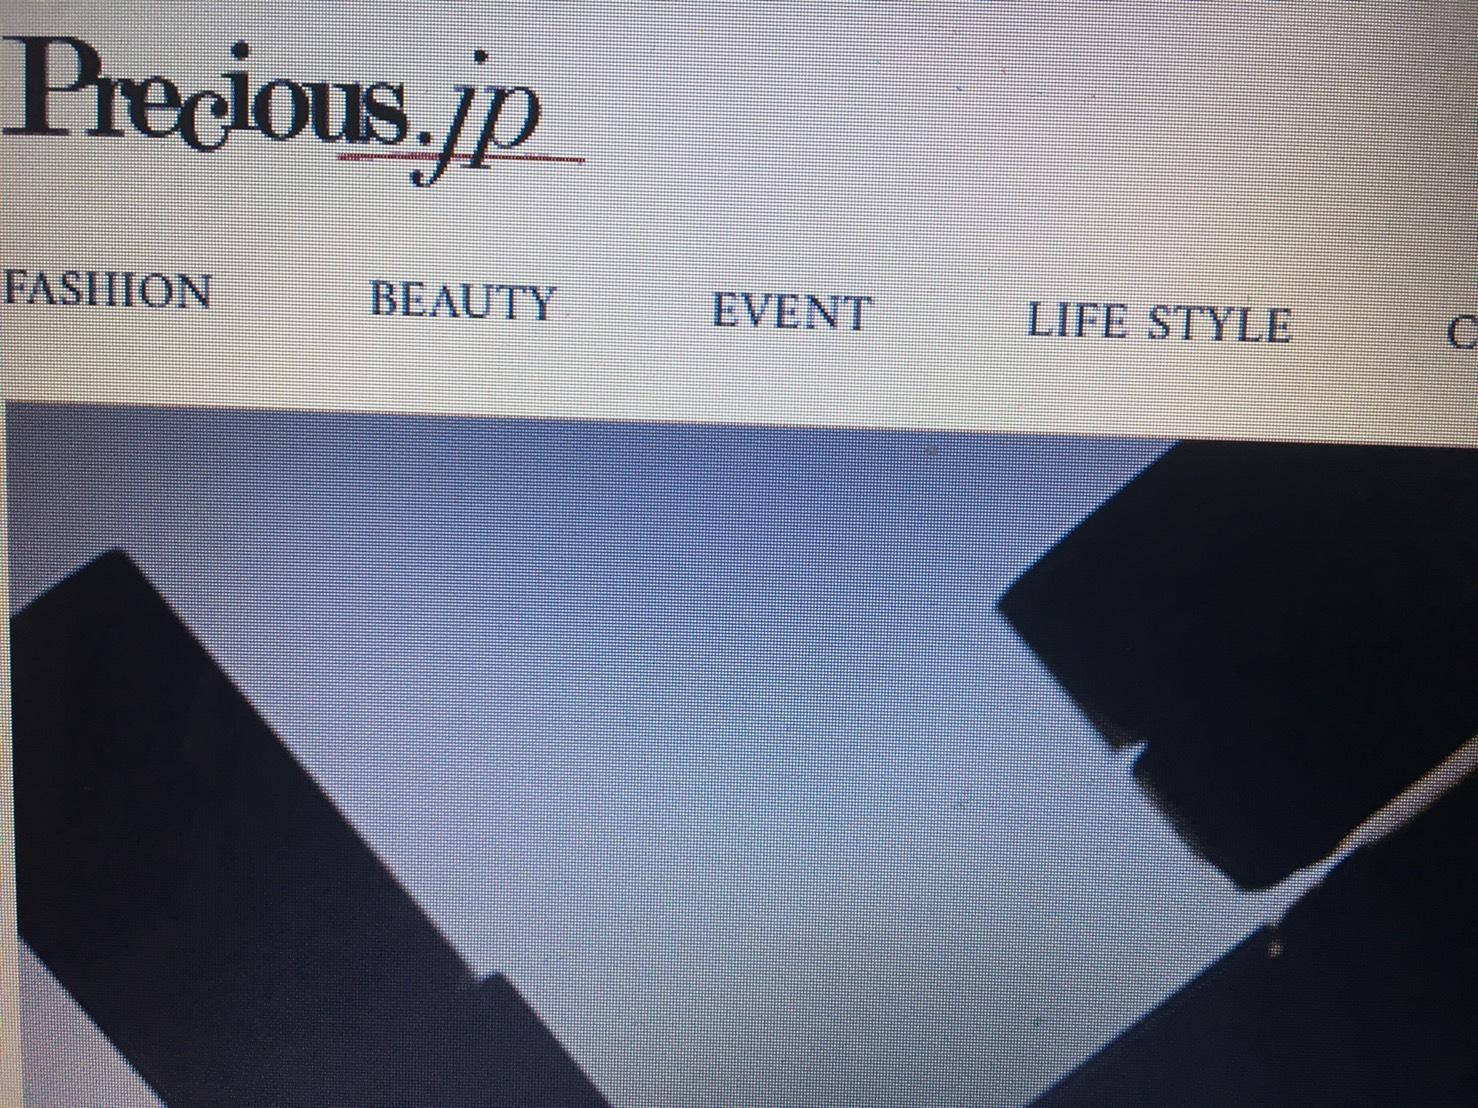 【NEWS】『Precious.jp』様にインタビューが載りました!